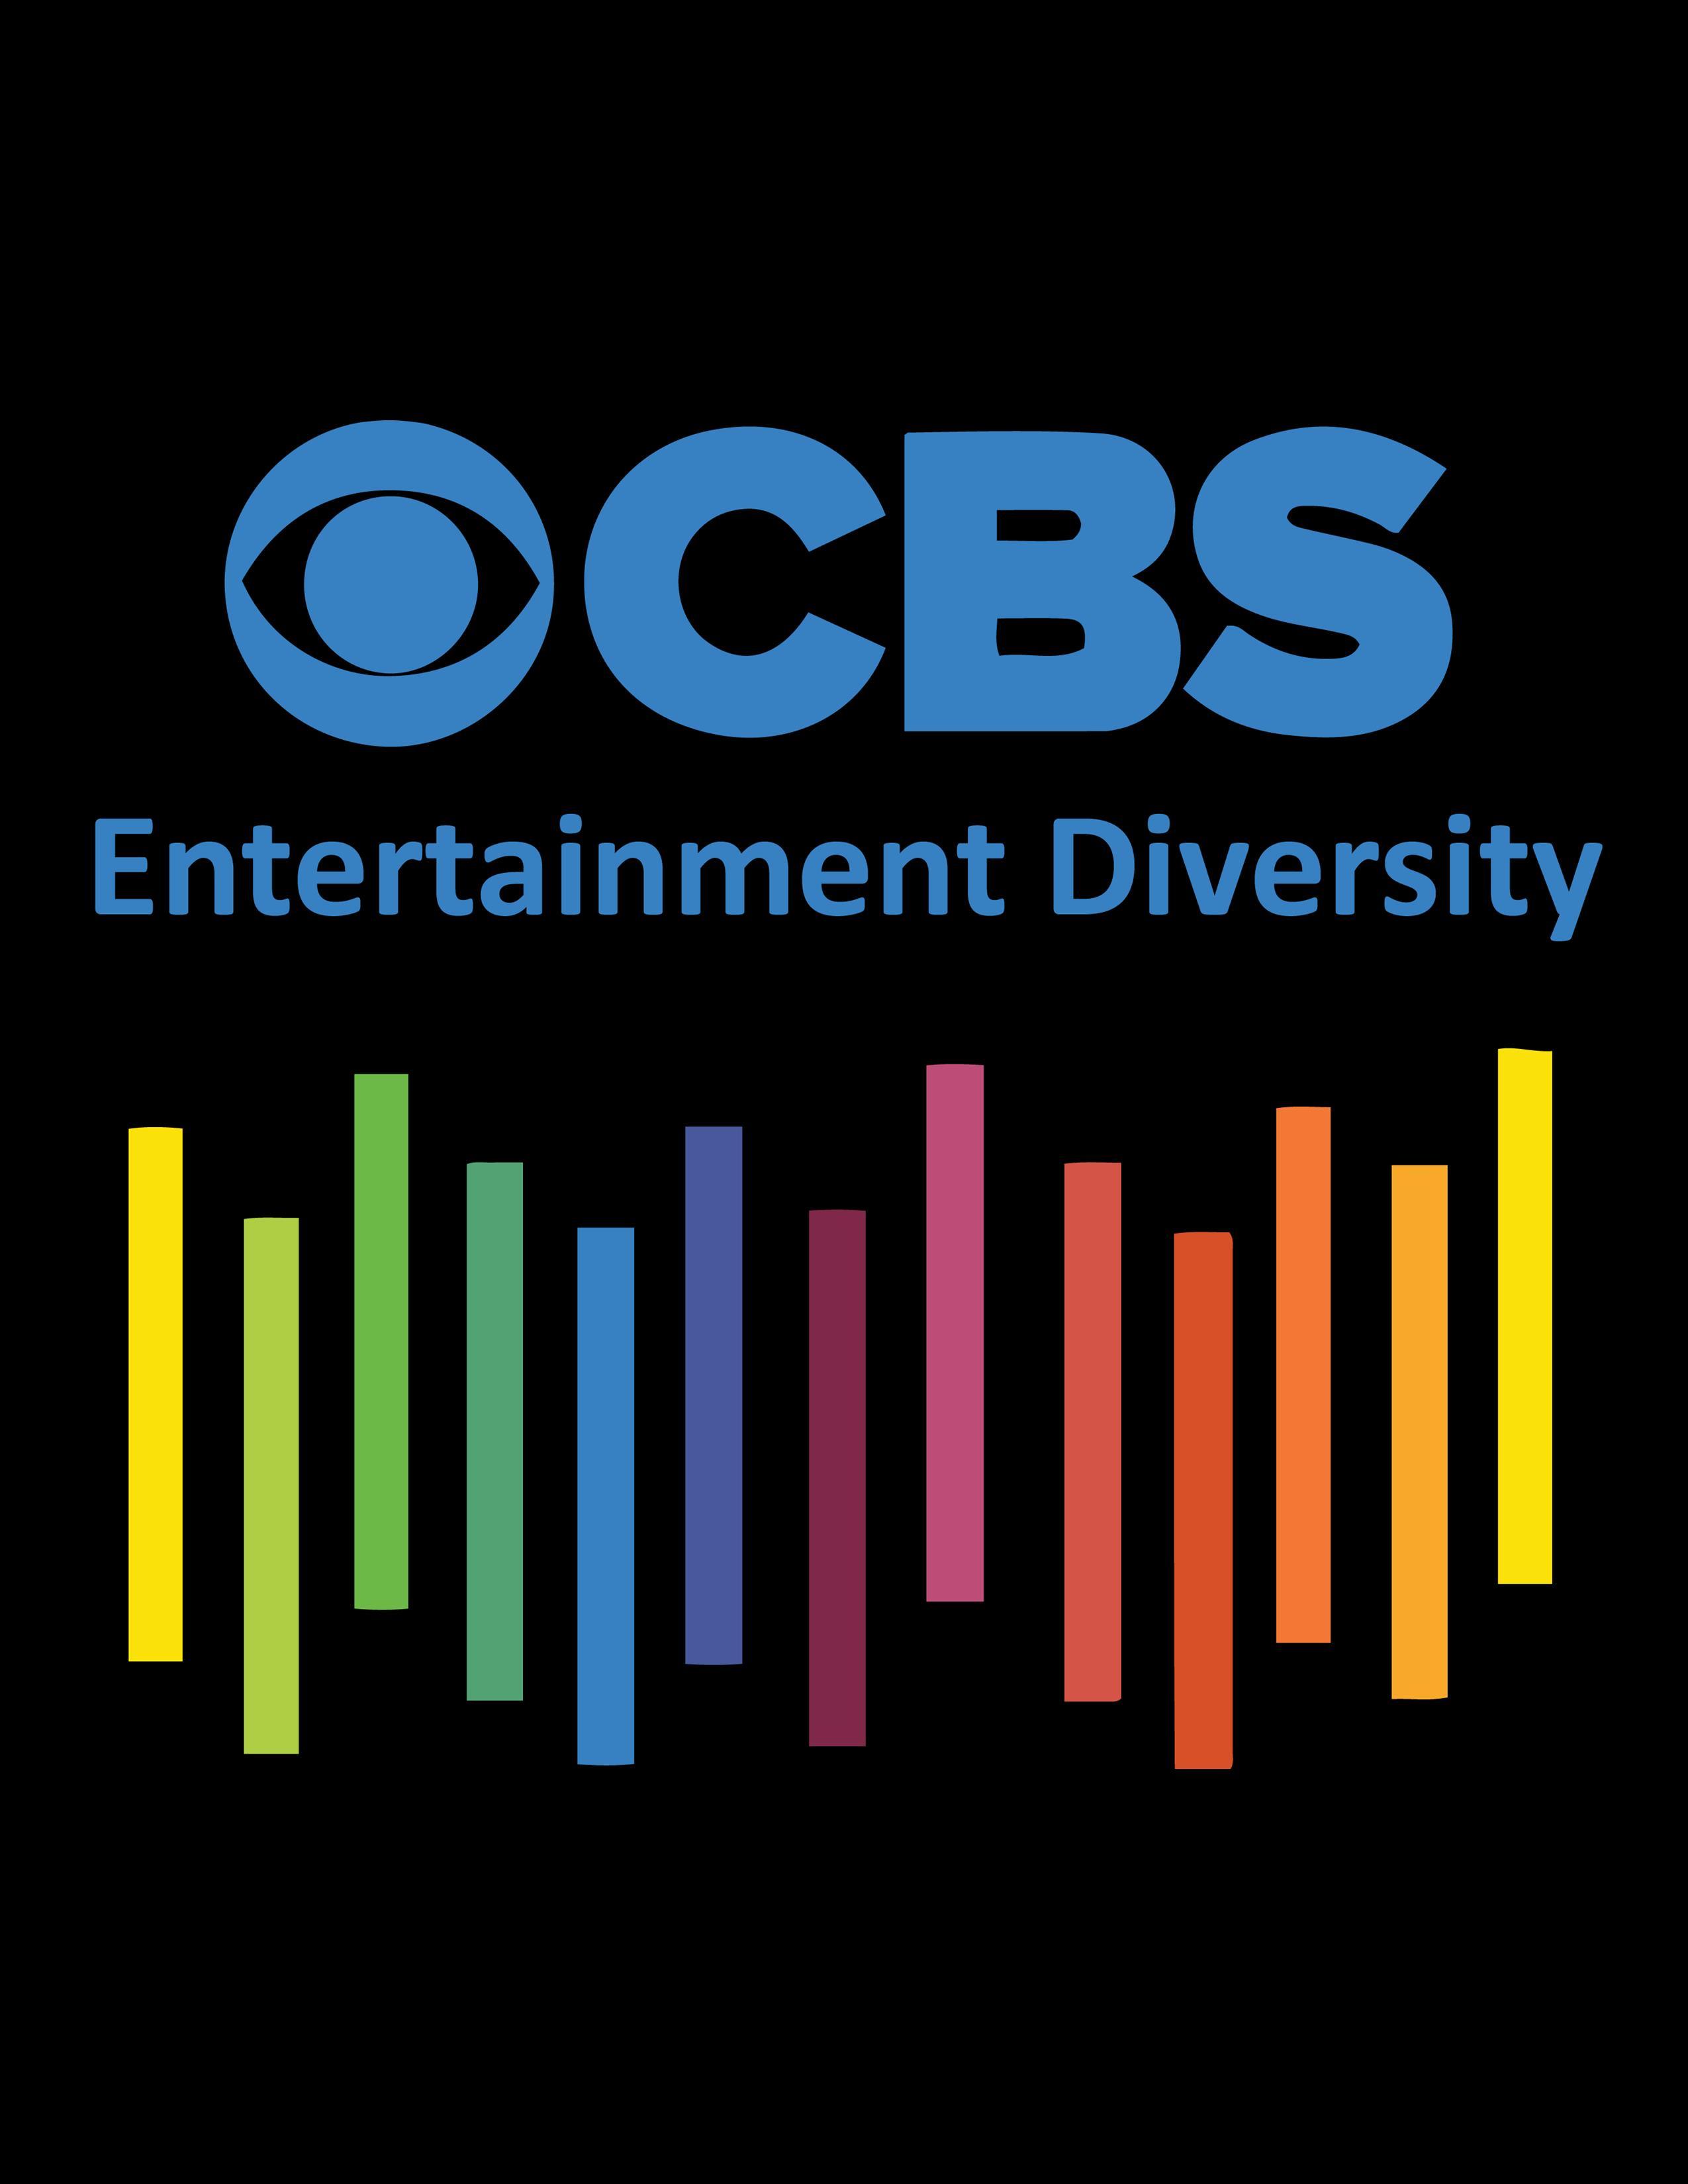 cbsentdiversity-logo-black